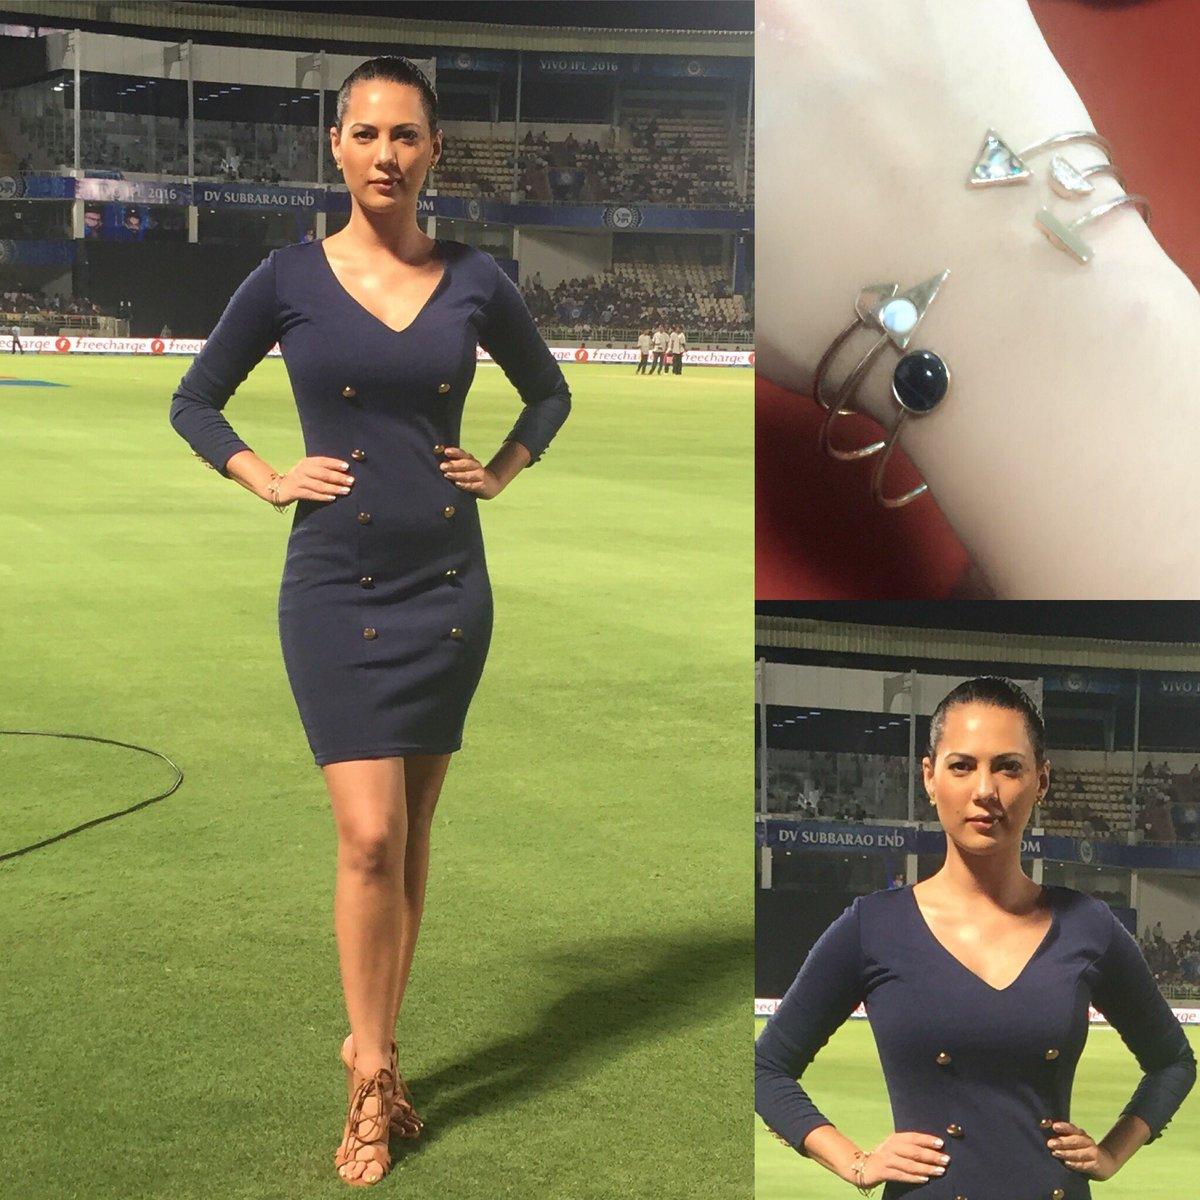 Rochelle Maria Rao,Rochell Rao,IPL, 2016,Pics,Images,Photos,latest,Pics,hot